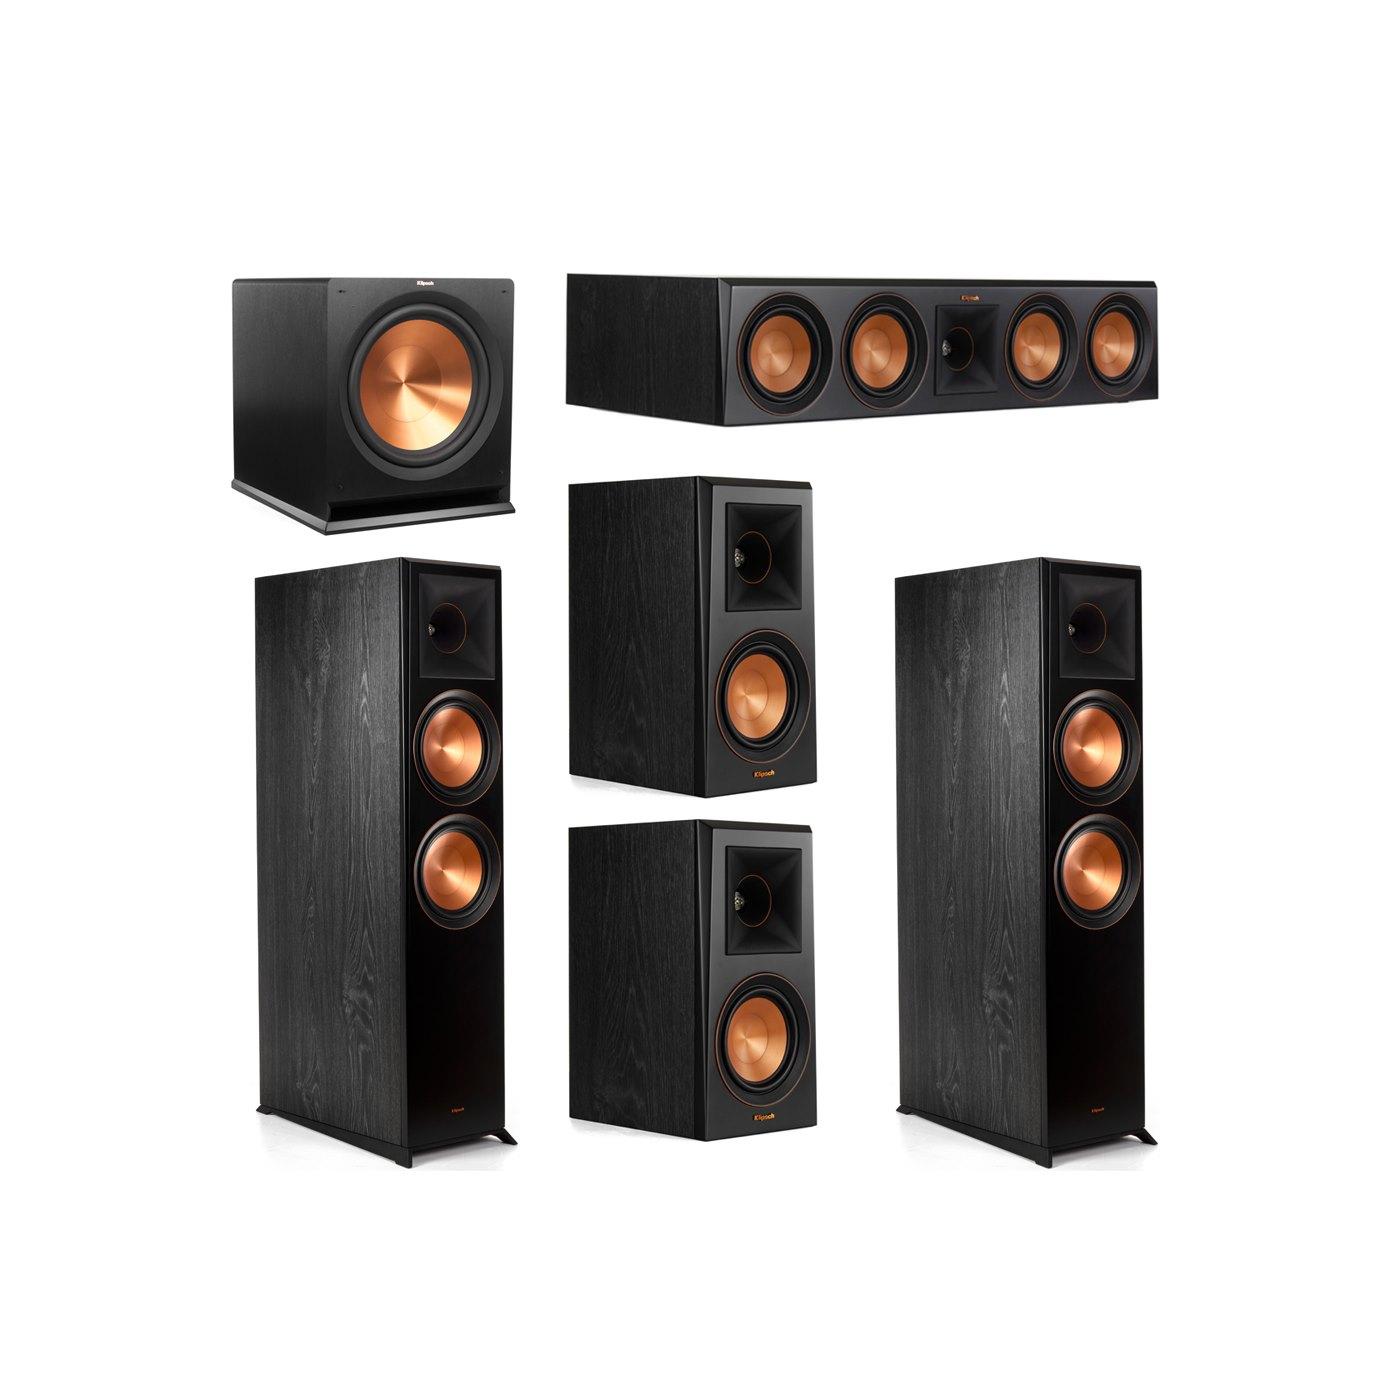 Klipsch 5.1 System with 2 RP-8000F Floorstanding Speakers, 1 Klipsch RP-504C Center Speaker, 2 Klipsch RP-500M Surround Speakers, 1 Klipsch R-115SW Subwoofer